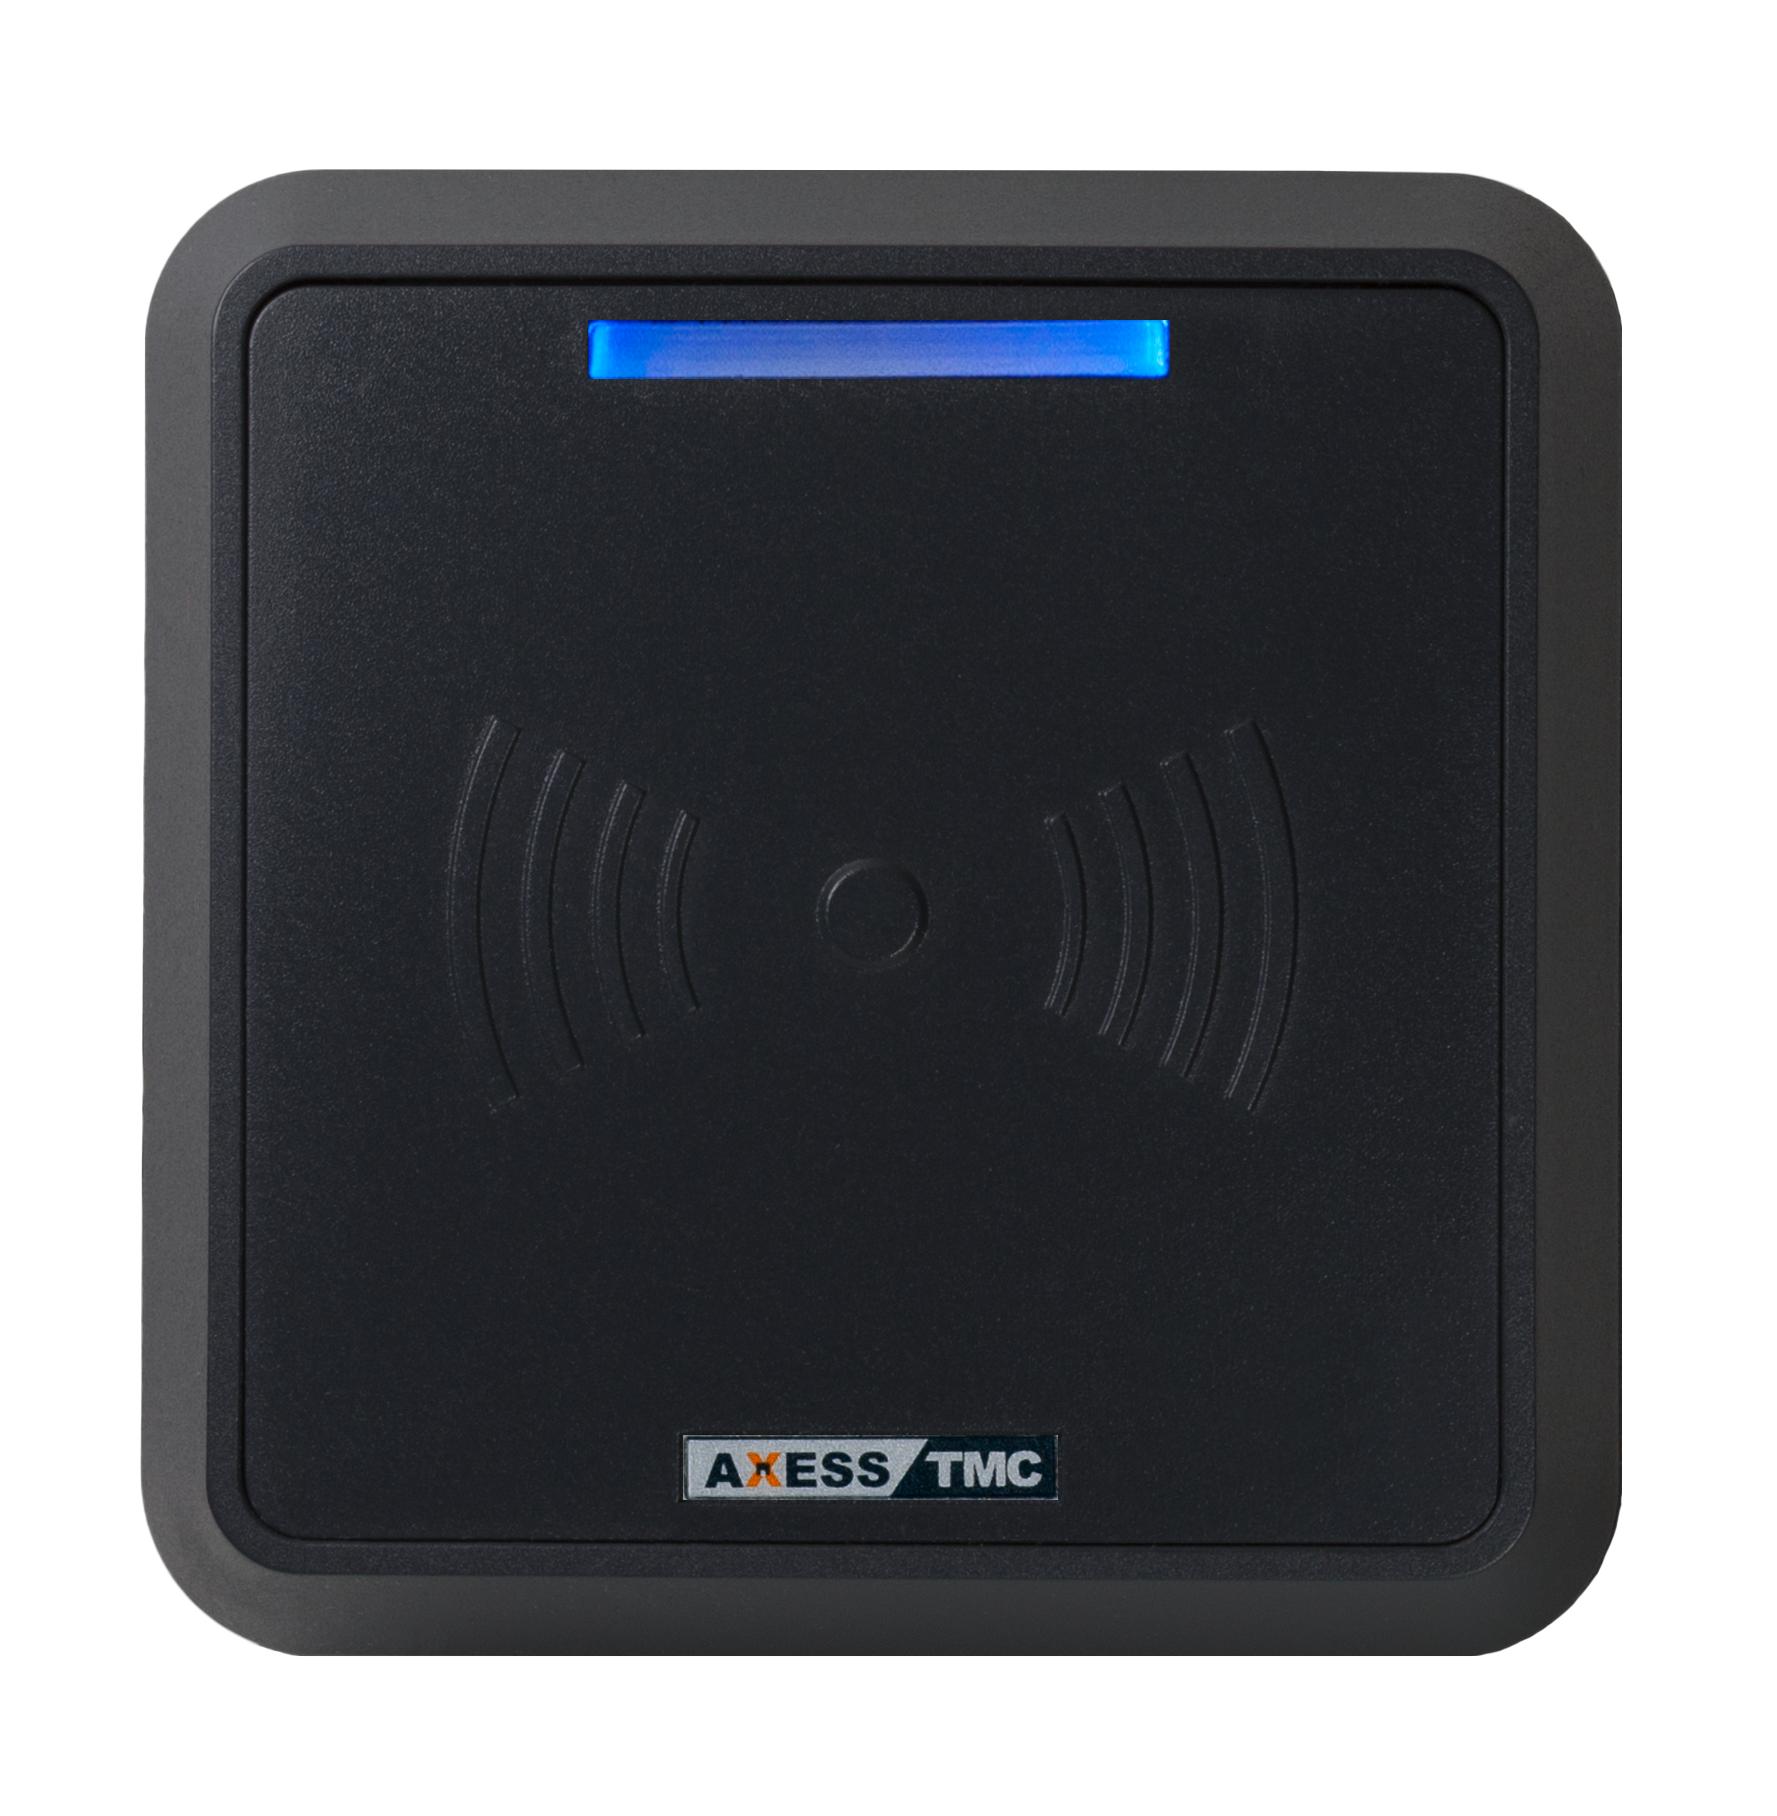 Leitor de Controlo de Acessos RFID3 Preto - Vista Lateral